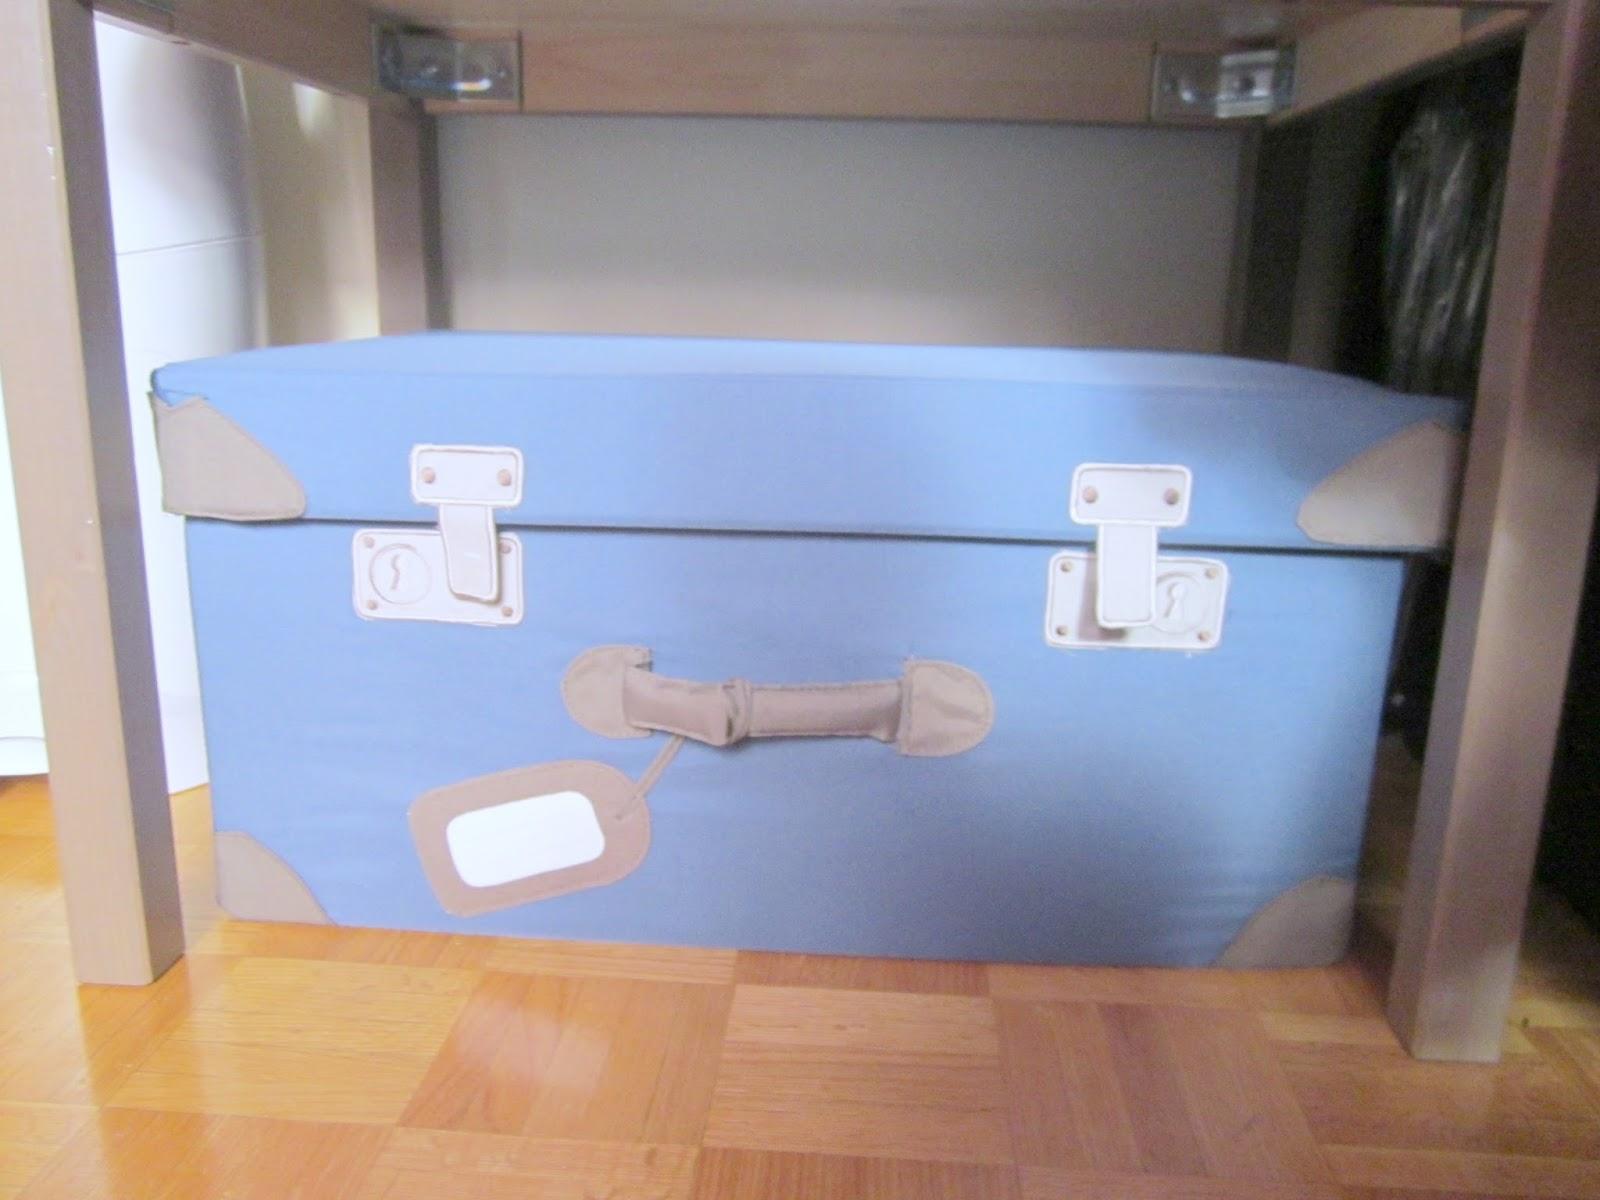 & IKEA PYSSLINGAR Toy Box - City of Creative Dreams Aboutintivar.Com